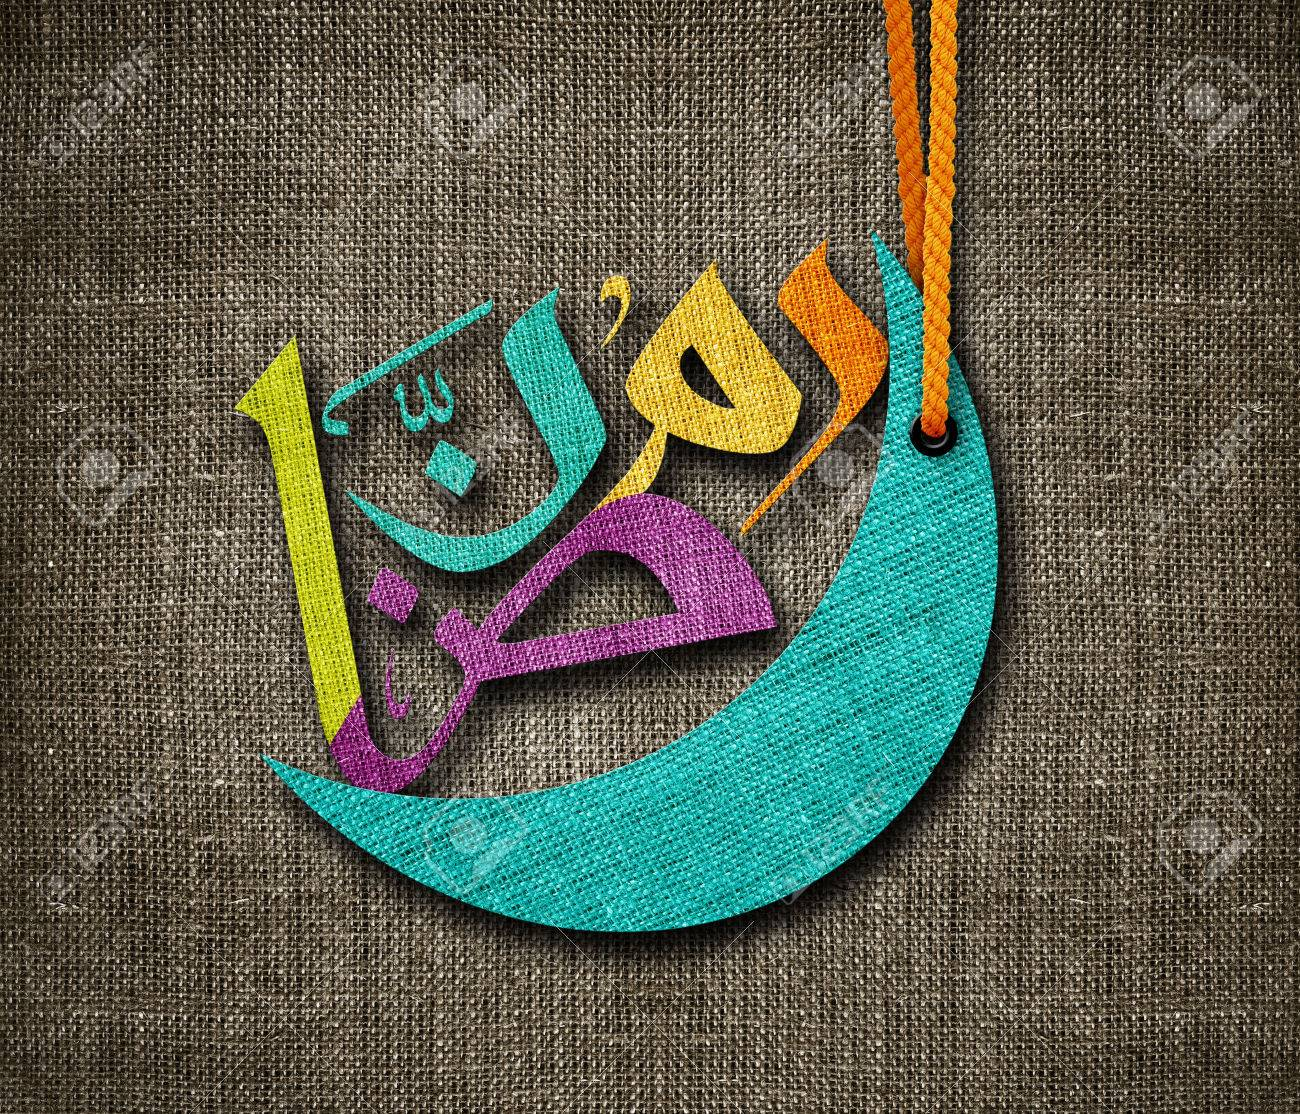 Amazing Ramadan Eid Al-Fitr Greeting - 39373232-the-holy-month-of-muslim-community-festival-ramadan-kareem-and-eid-al-fitr-greeting-card-with-arabic  Pictures_242191 .jpg